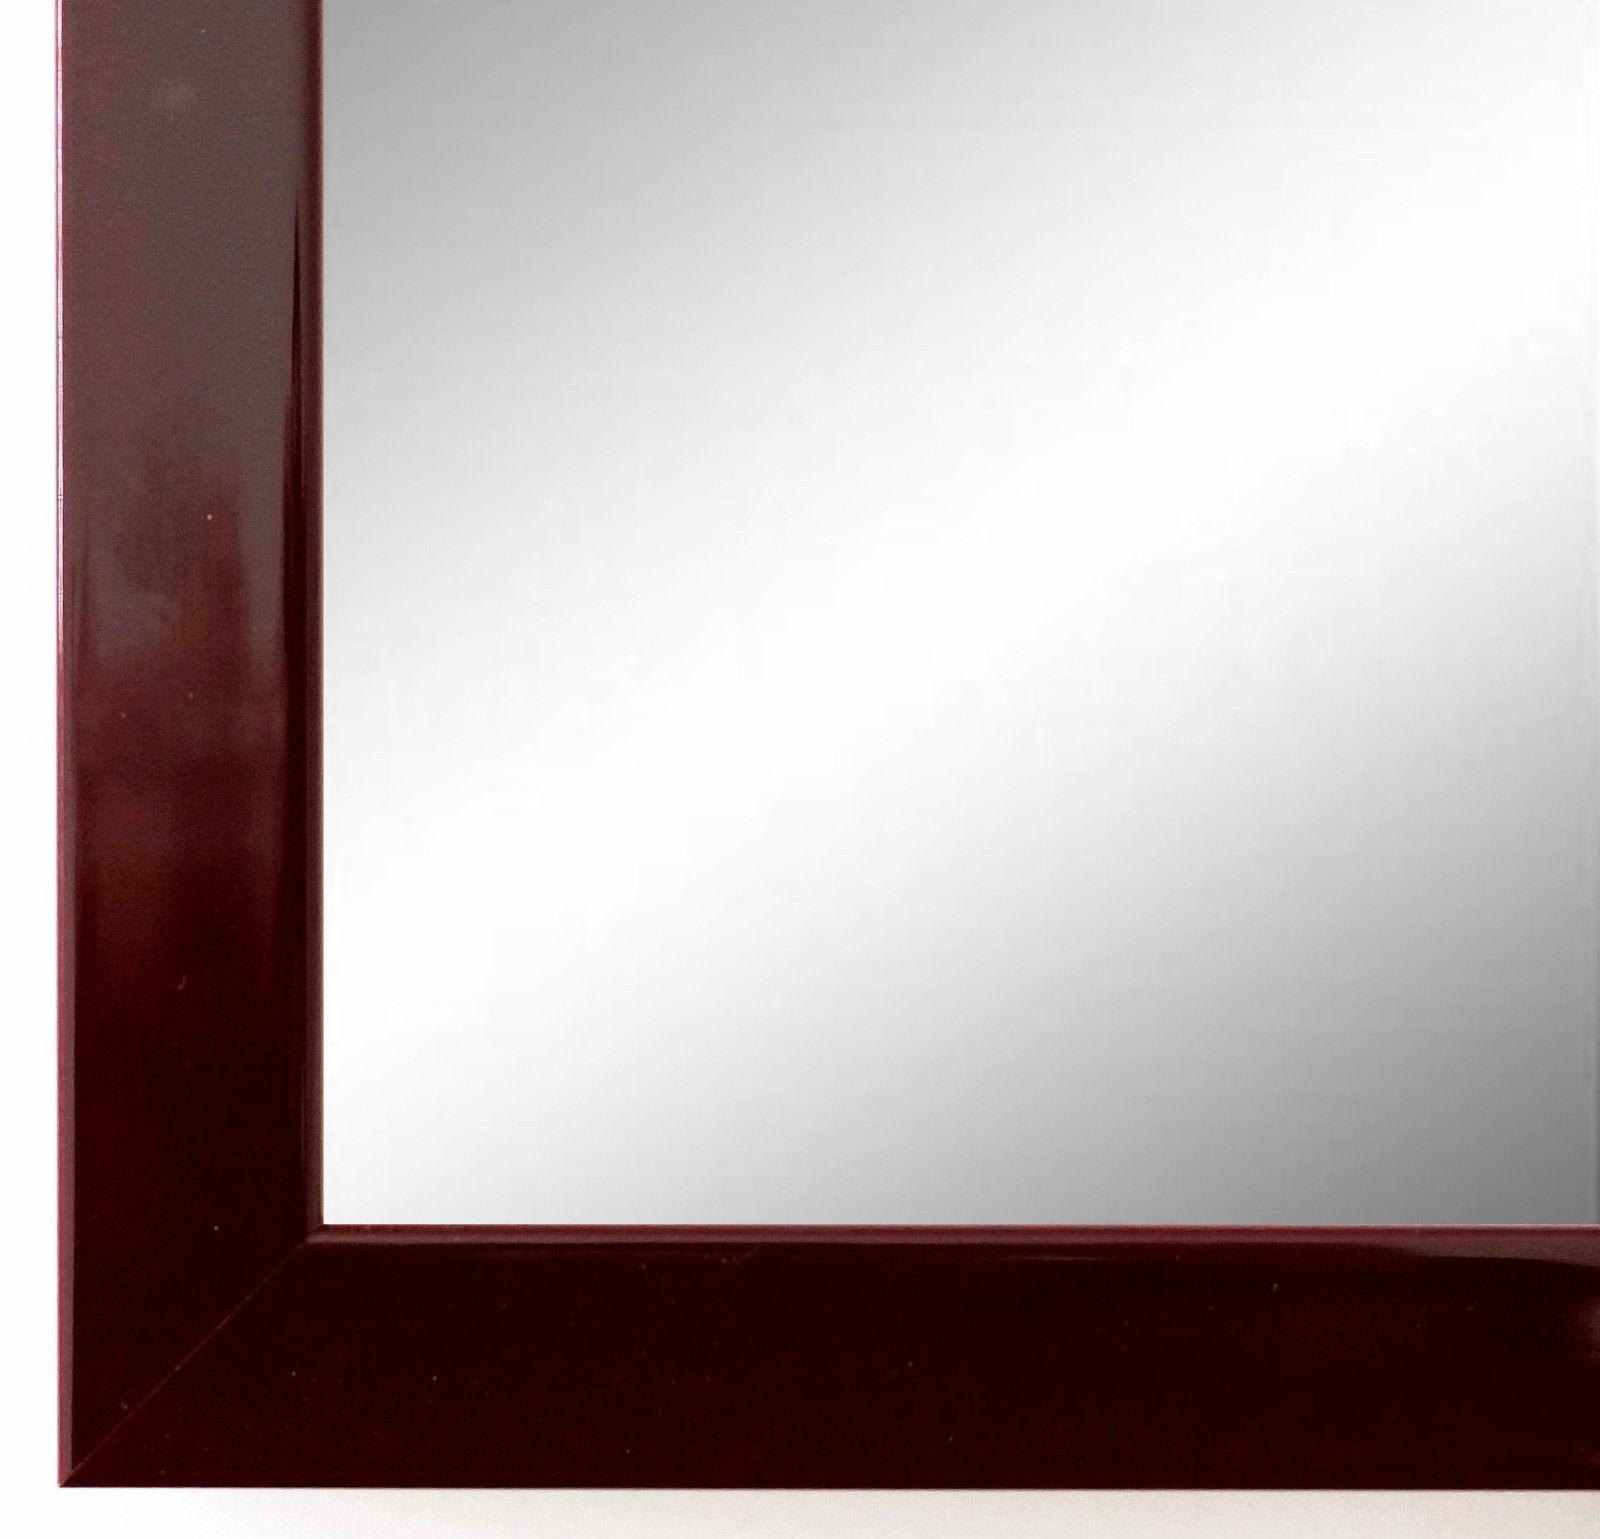 Wandspiegel Modern spiegel wandspiegel badspiegel flur garderobe modern como dunkel rot